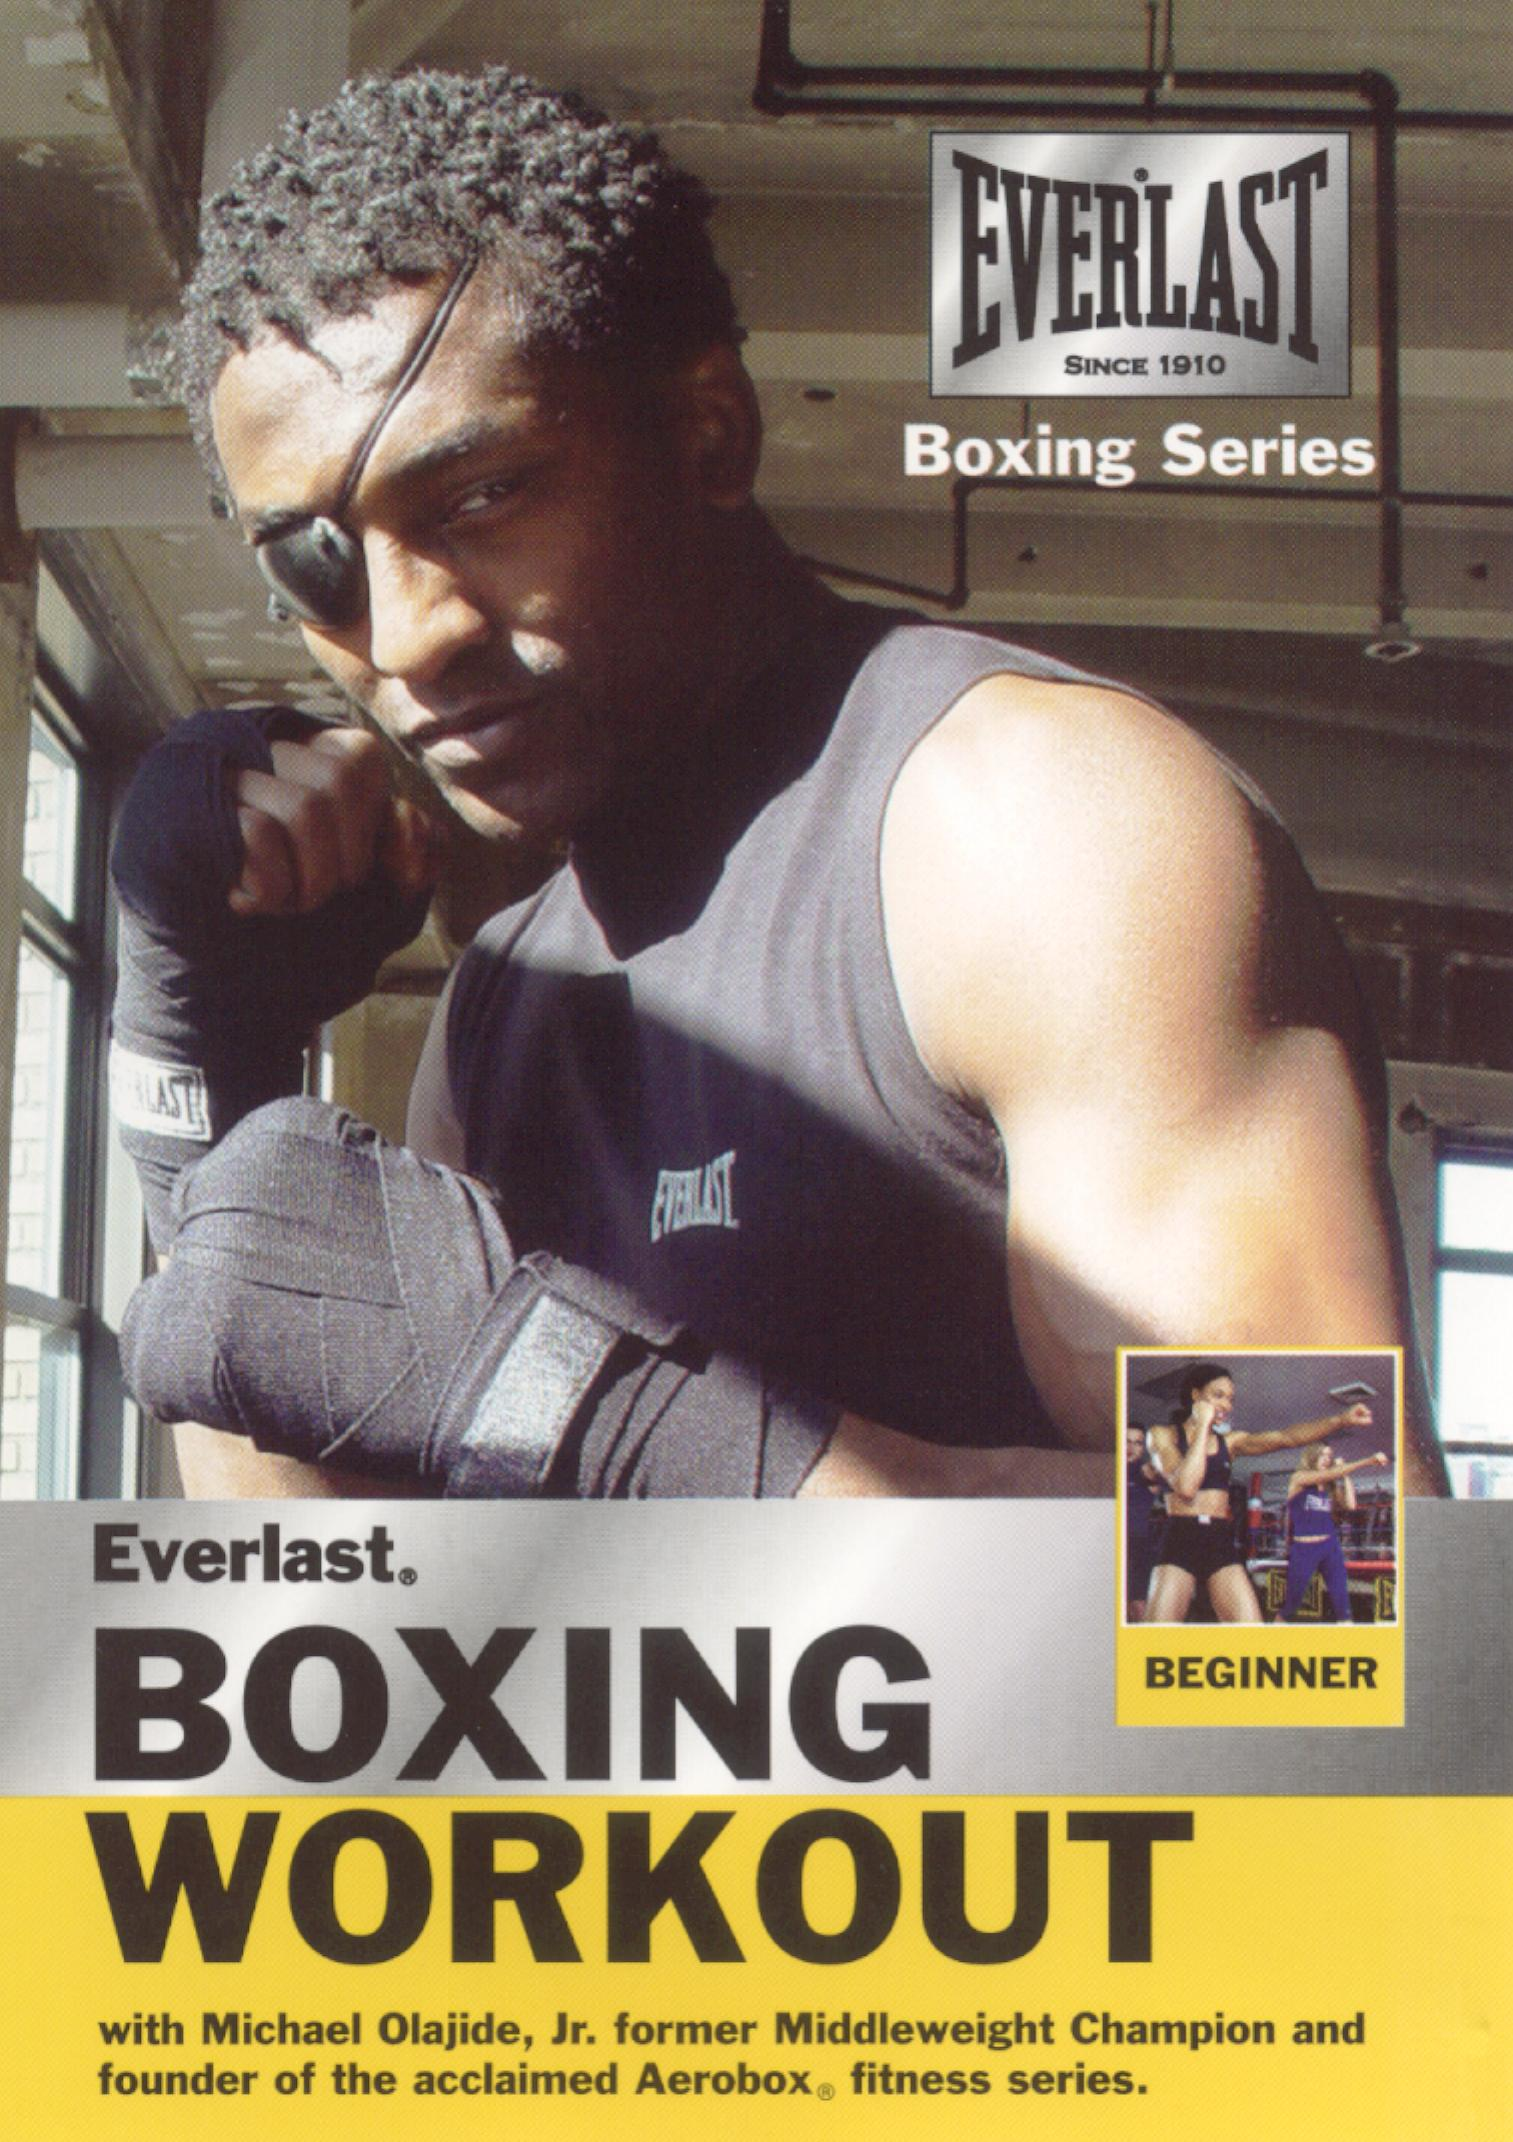 Everlast Boxing Workout: Beginner